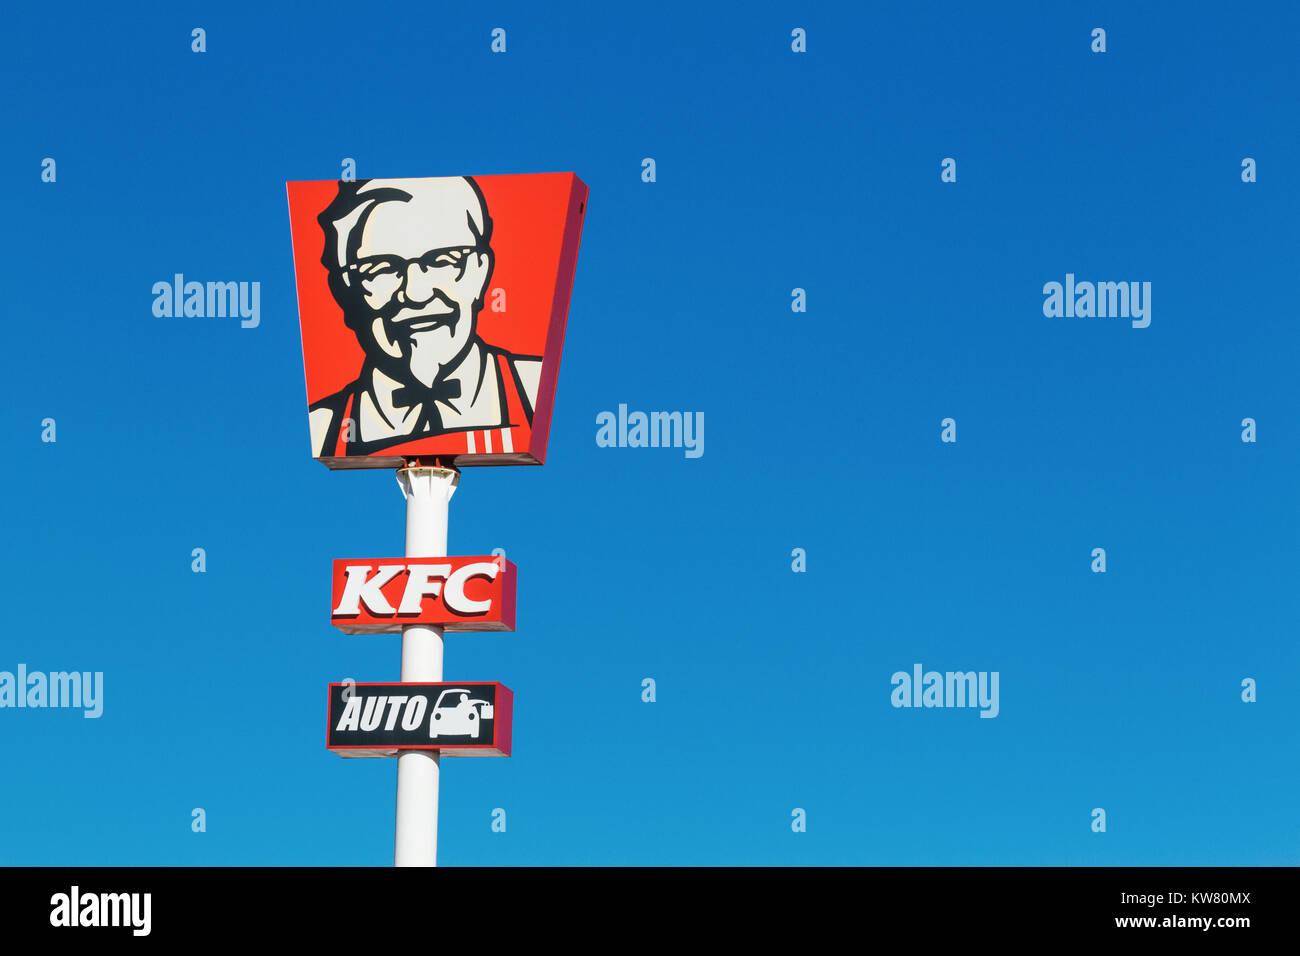 Kfc Fast Food Restaurants Logos